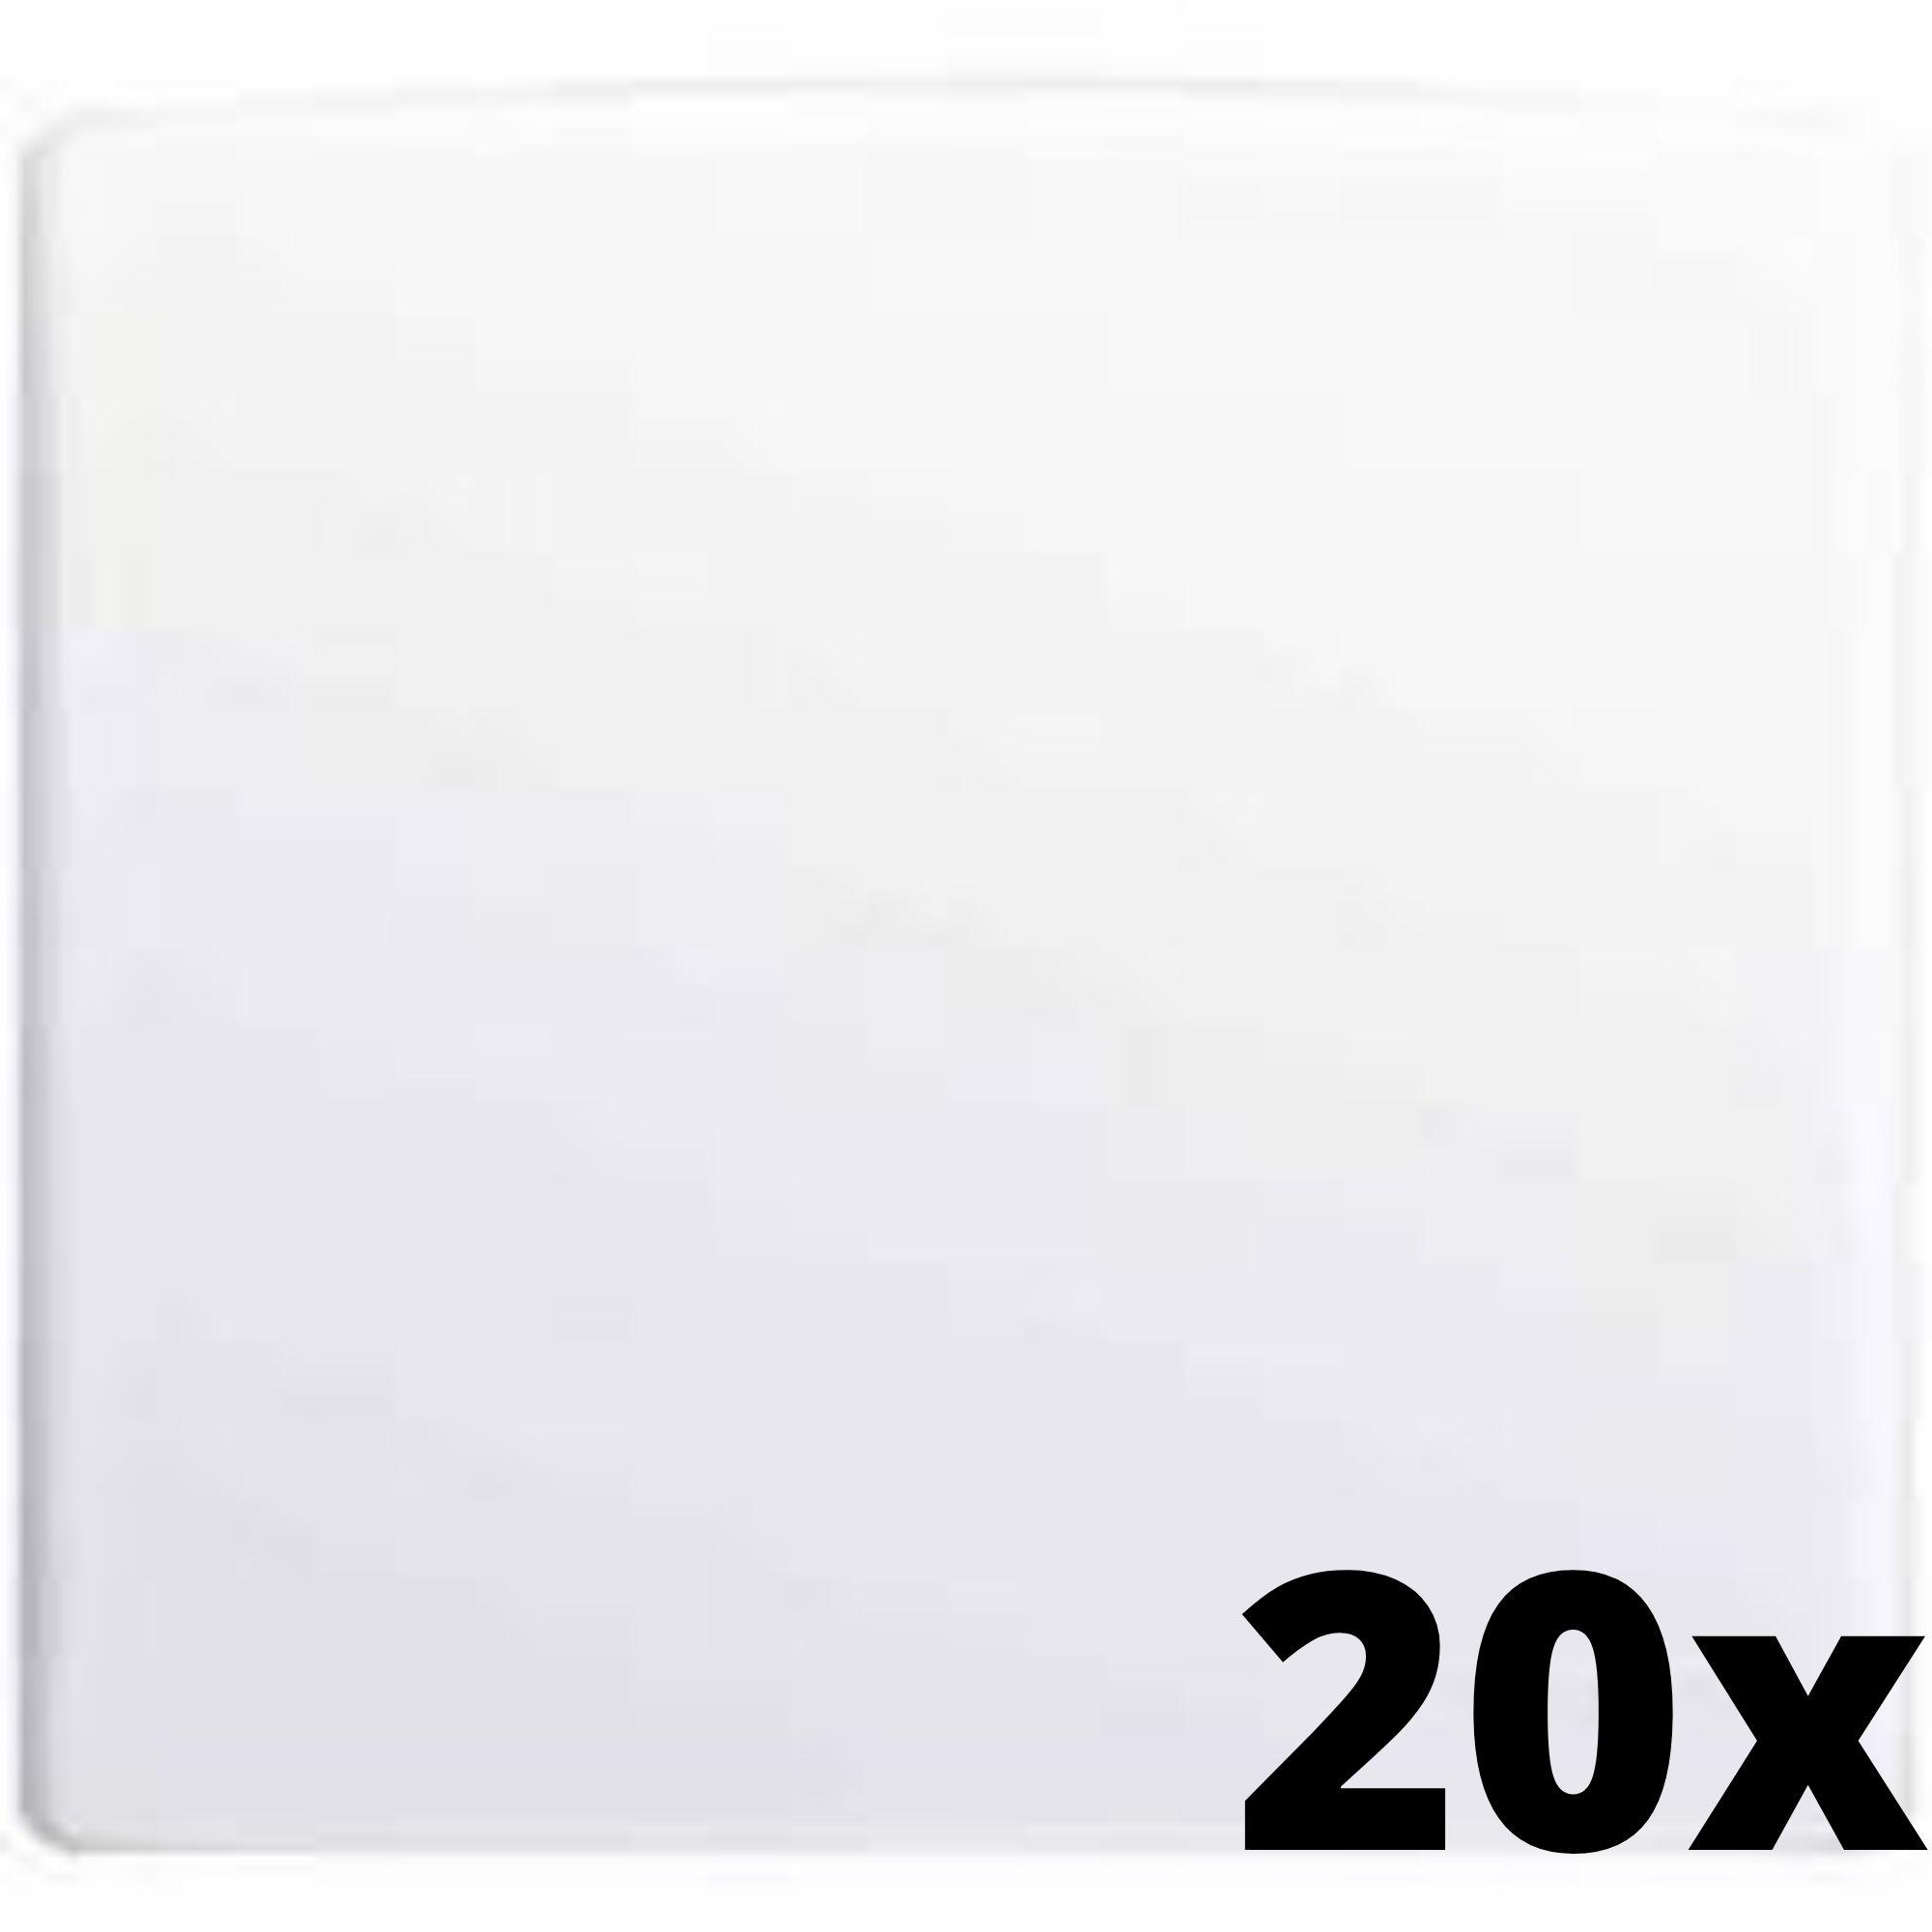 Kit 20 und Alumbra Bianco Pró Placa 4x4 Cega